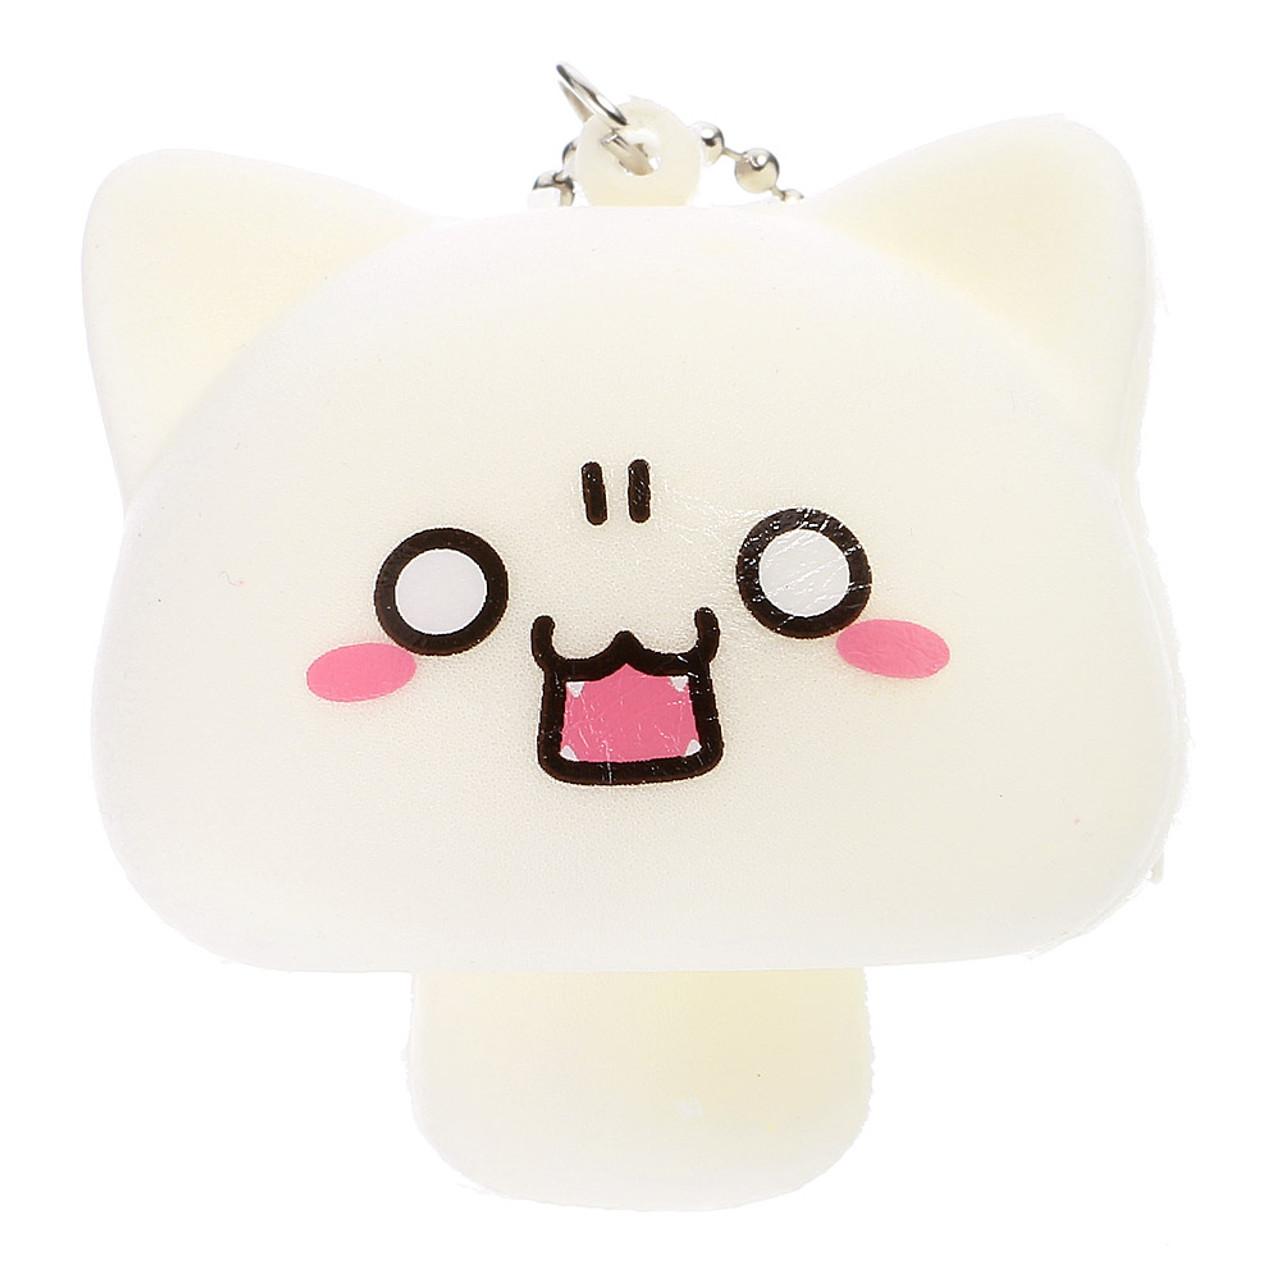 Wondrous Japan Neko Cat Facial Expression Beige Mushroom Squishy Toys Charms Download Free Architecture Designs Terstmadebymaigaardcom